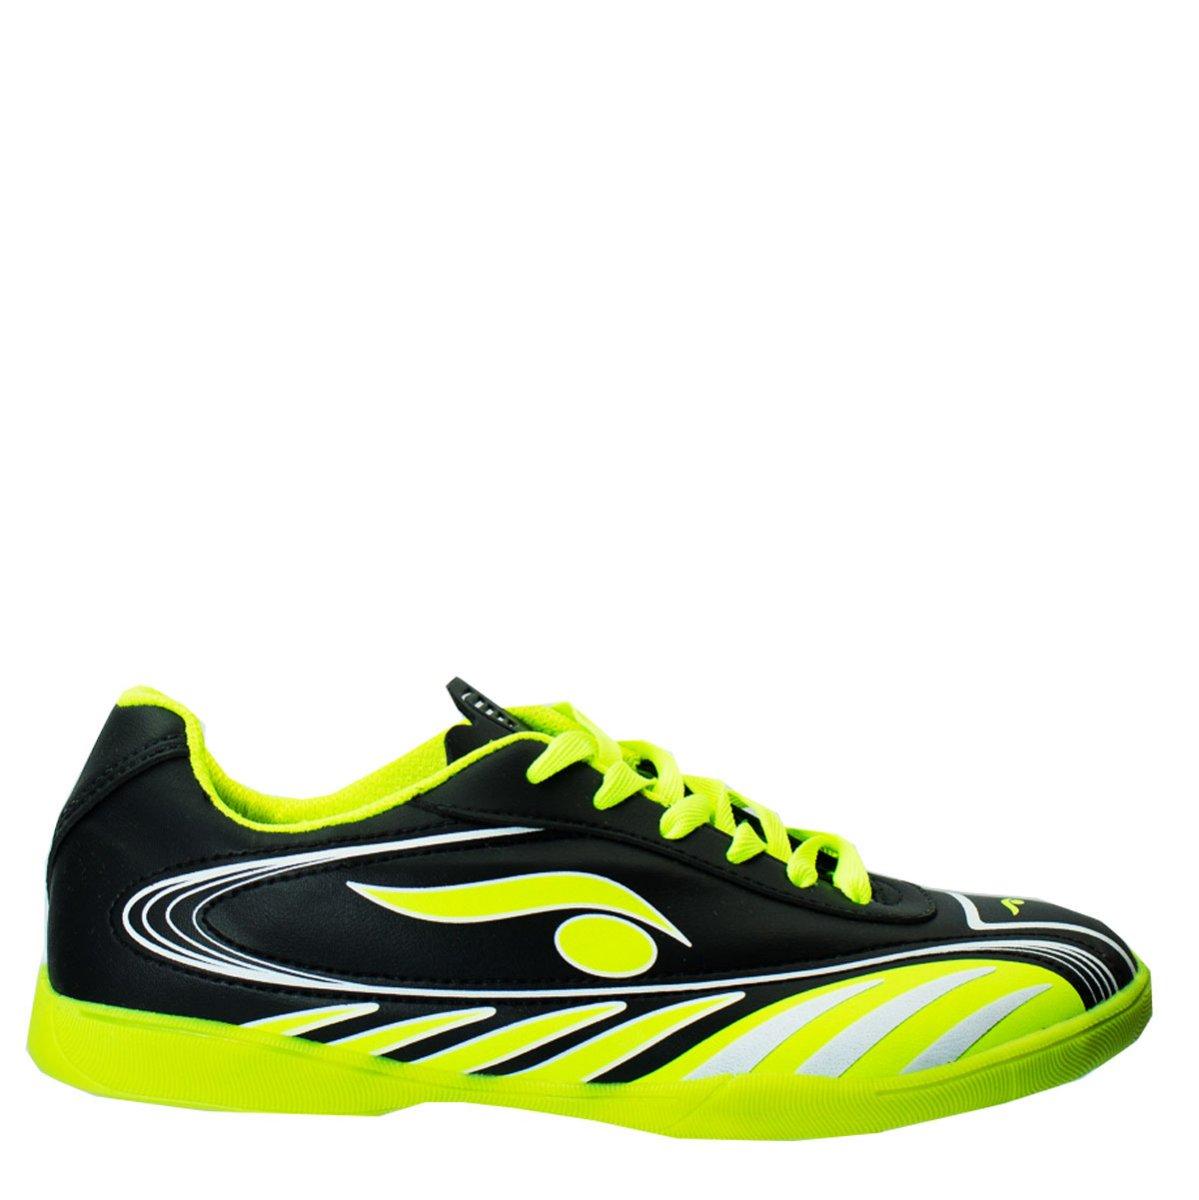 Imagem - Chuteira Futsal D Six Indoor 6203 - 056268 e72eaae2e40f4